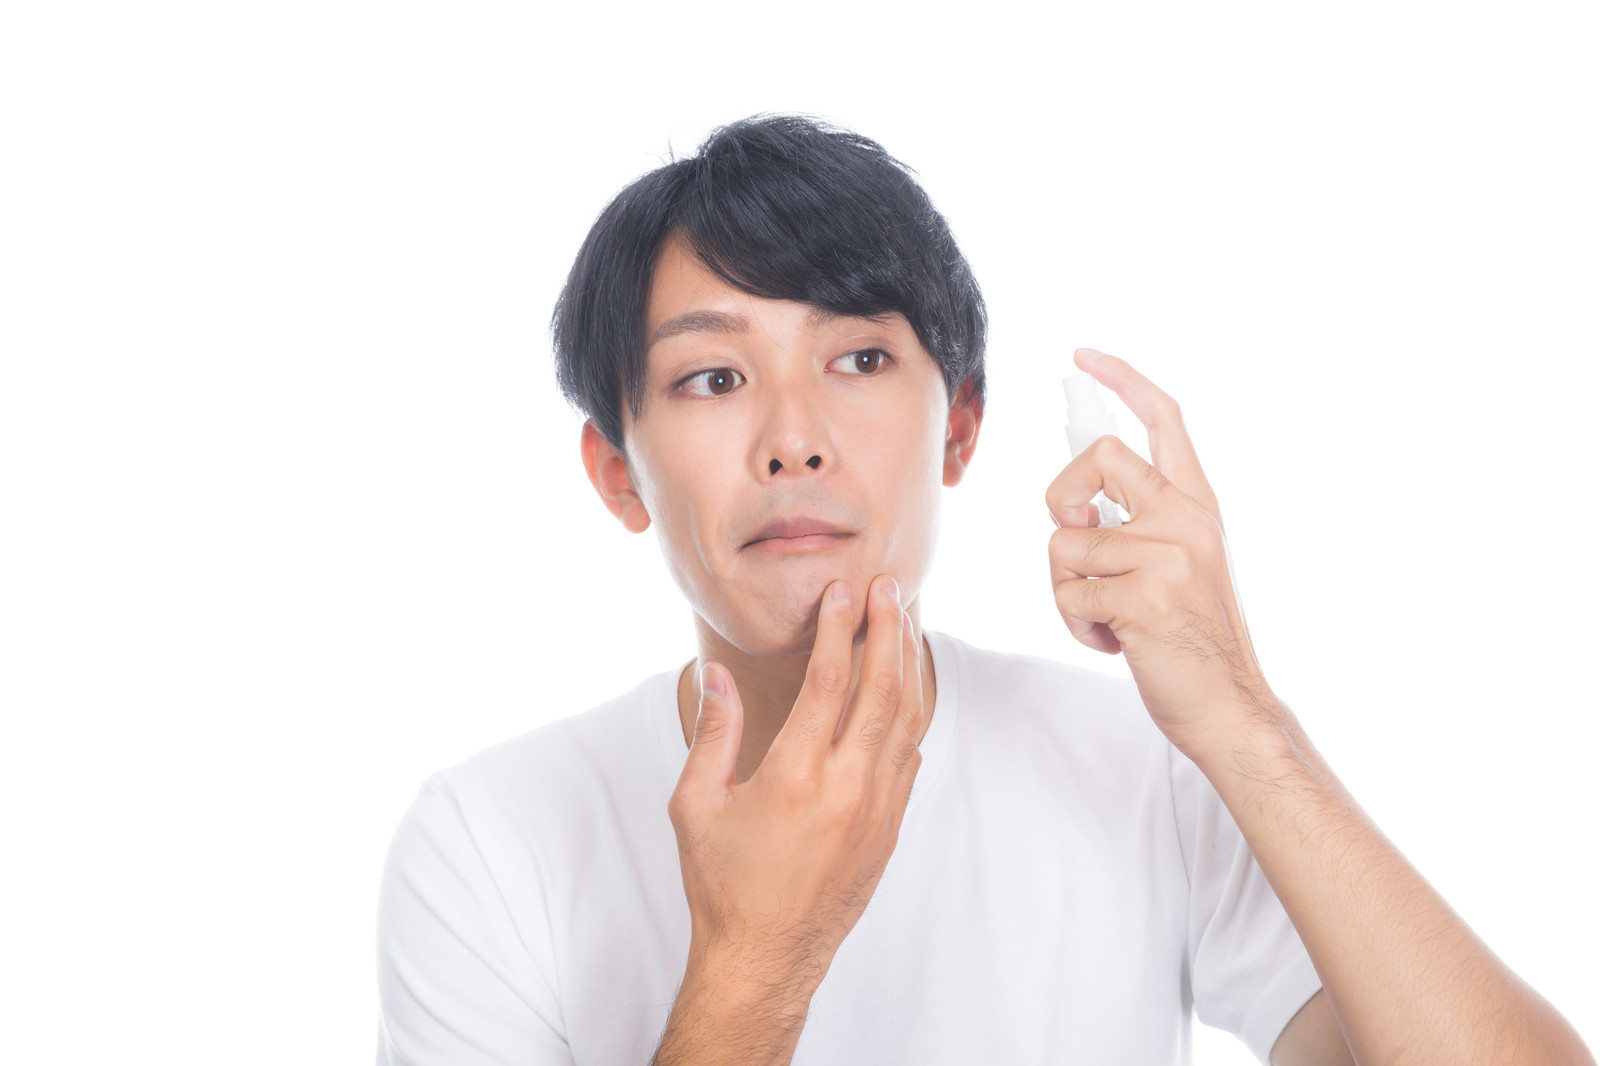 NULL BBクリームの口コミや効果まとめ!|ニキビ跡や青髭が目立たなくなる?!